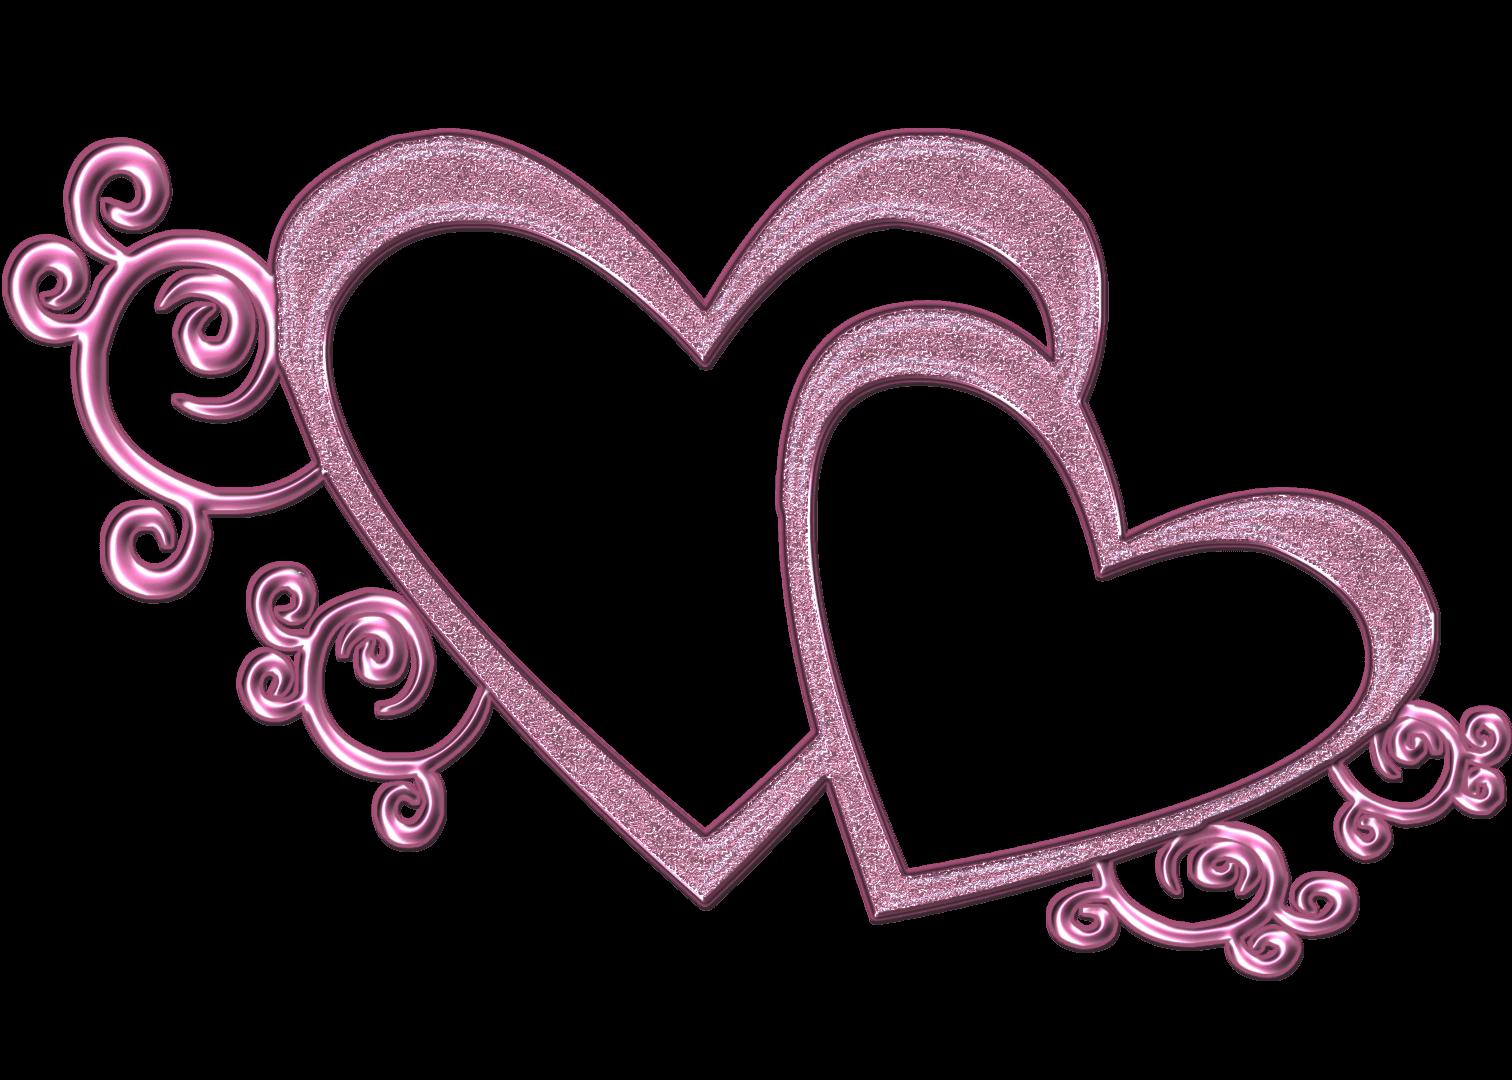 d2f0f1924e75b wedding heart design clipart hearts heart heart clip art wedding .